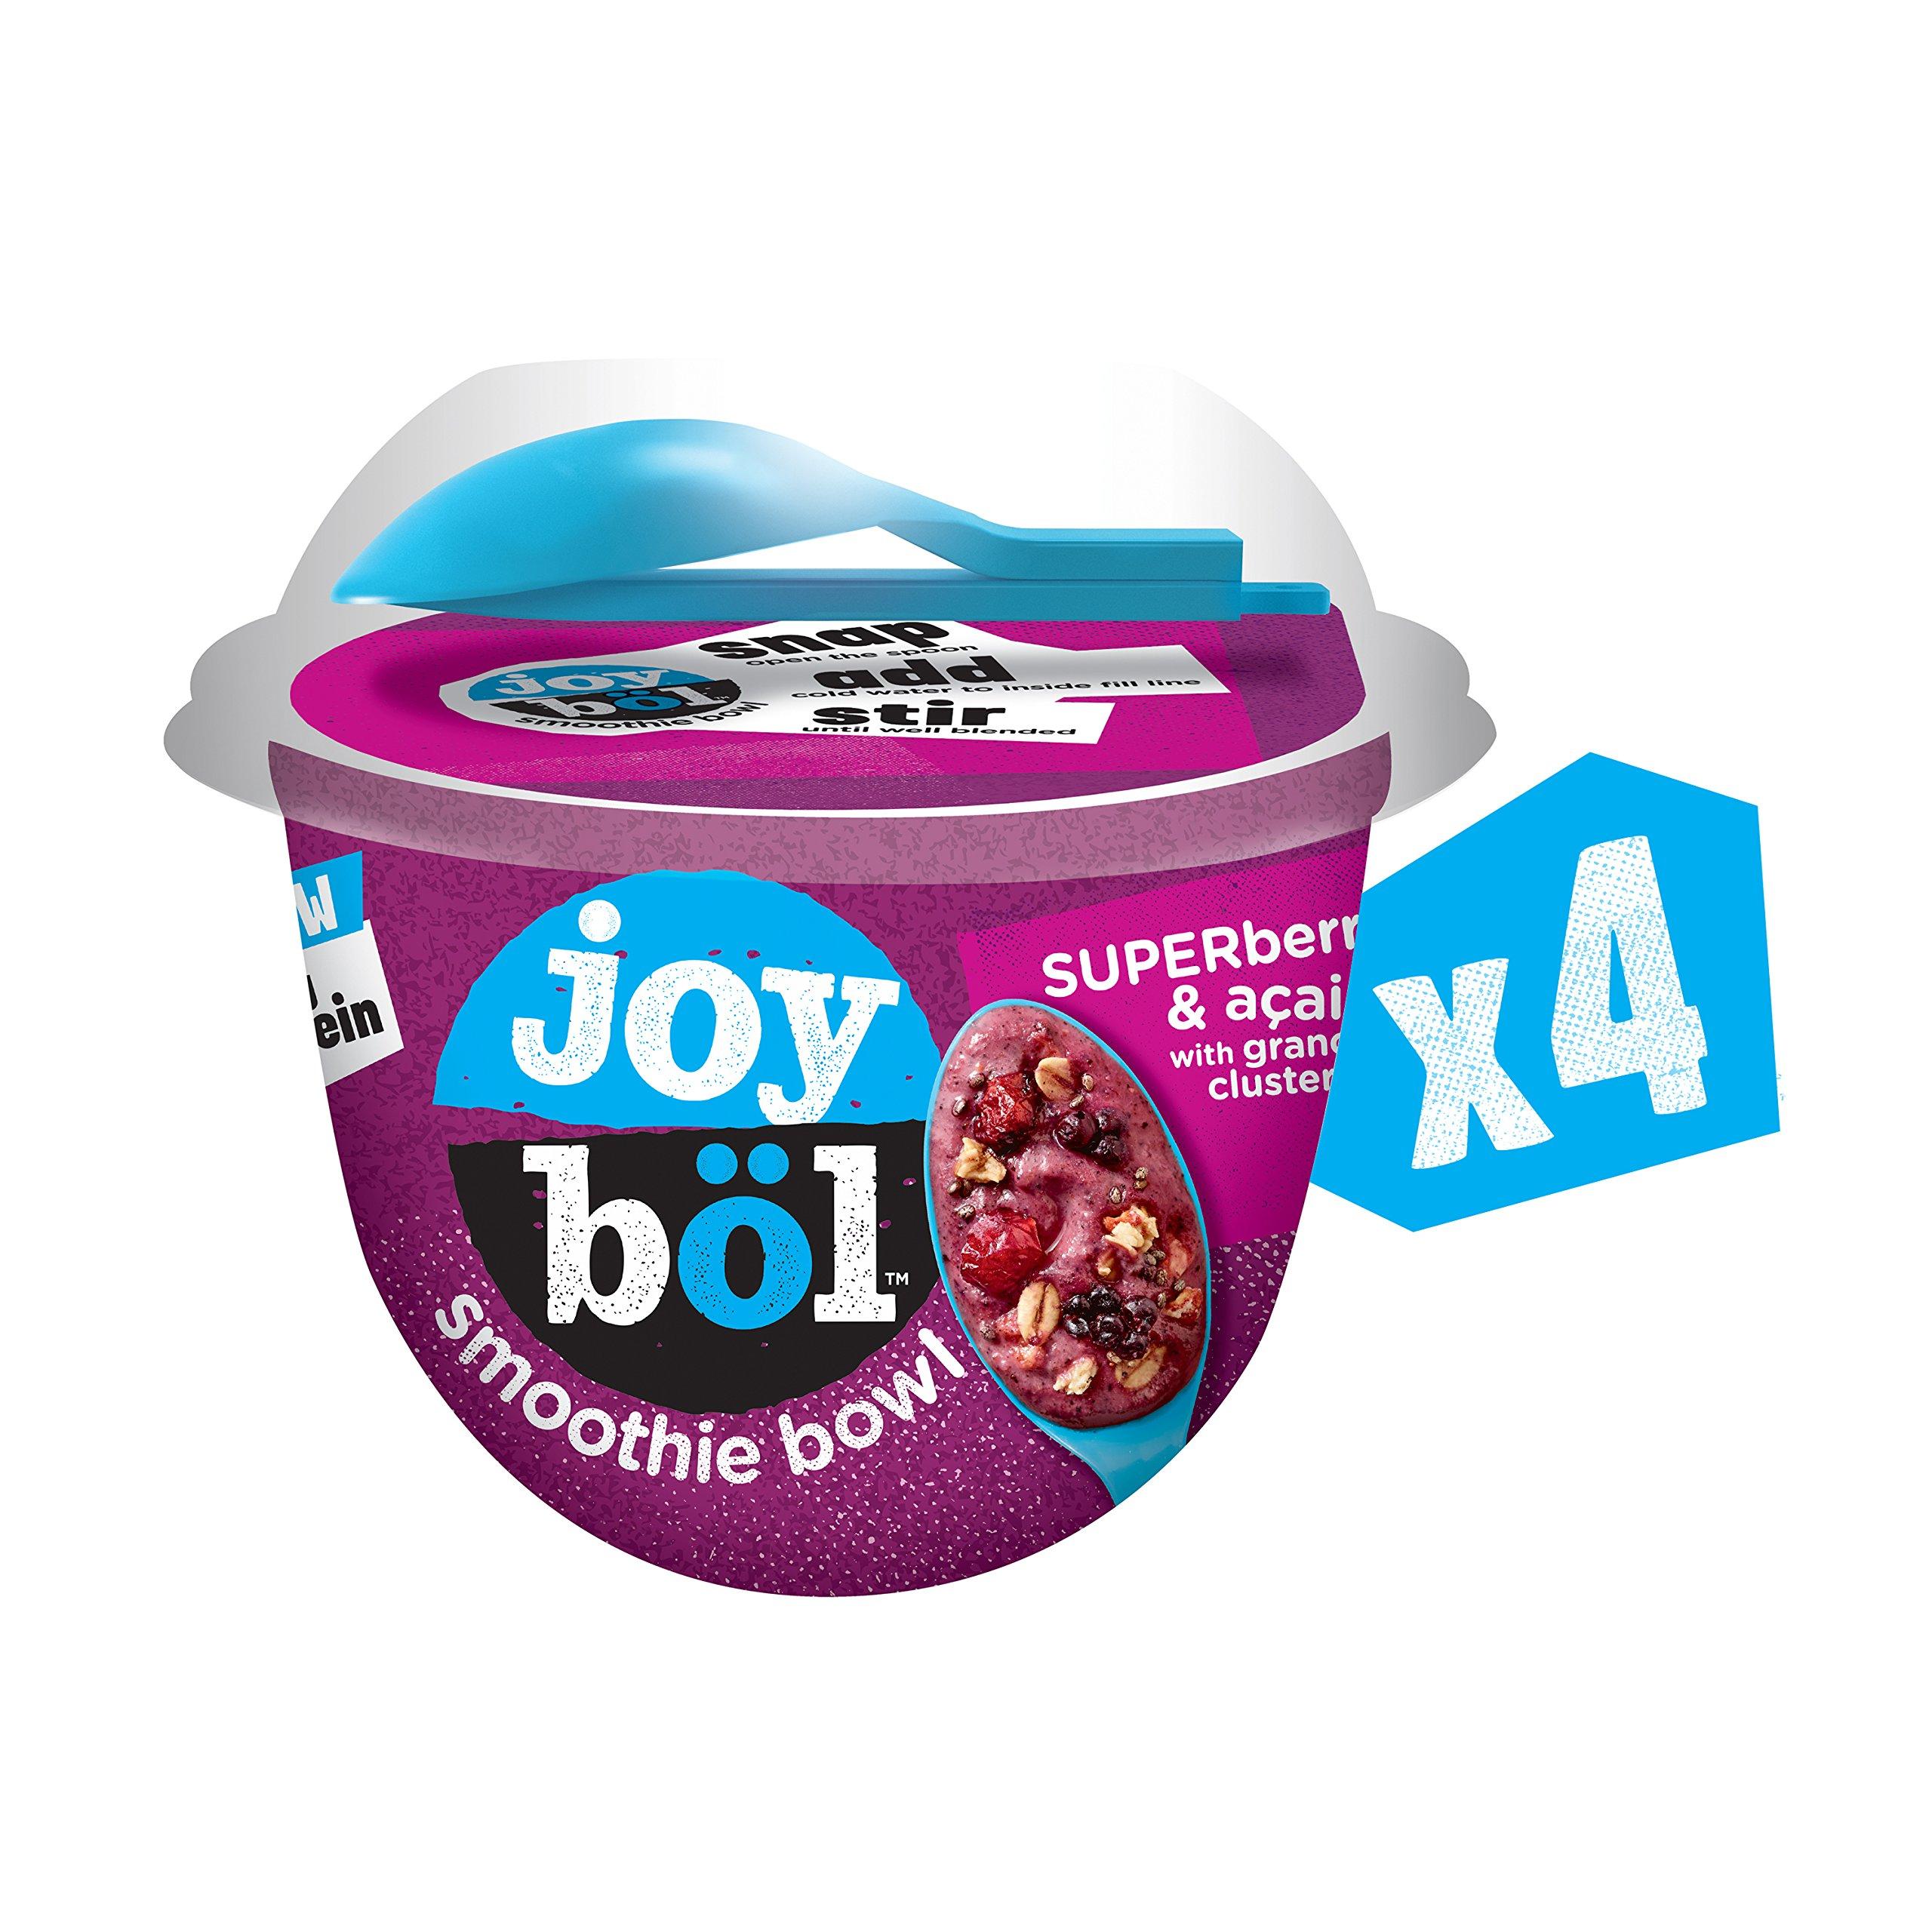 joyböl Smoothie Bowls, Superberries and Açai, Easy Breakfast, Non-GMO, 4 Count by joyböl